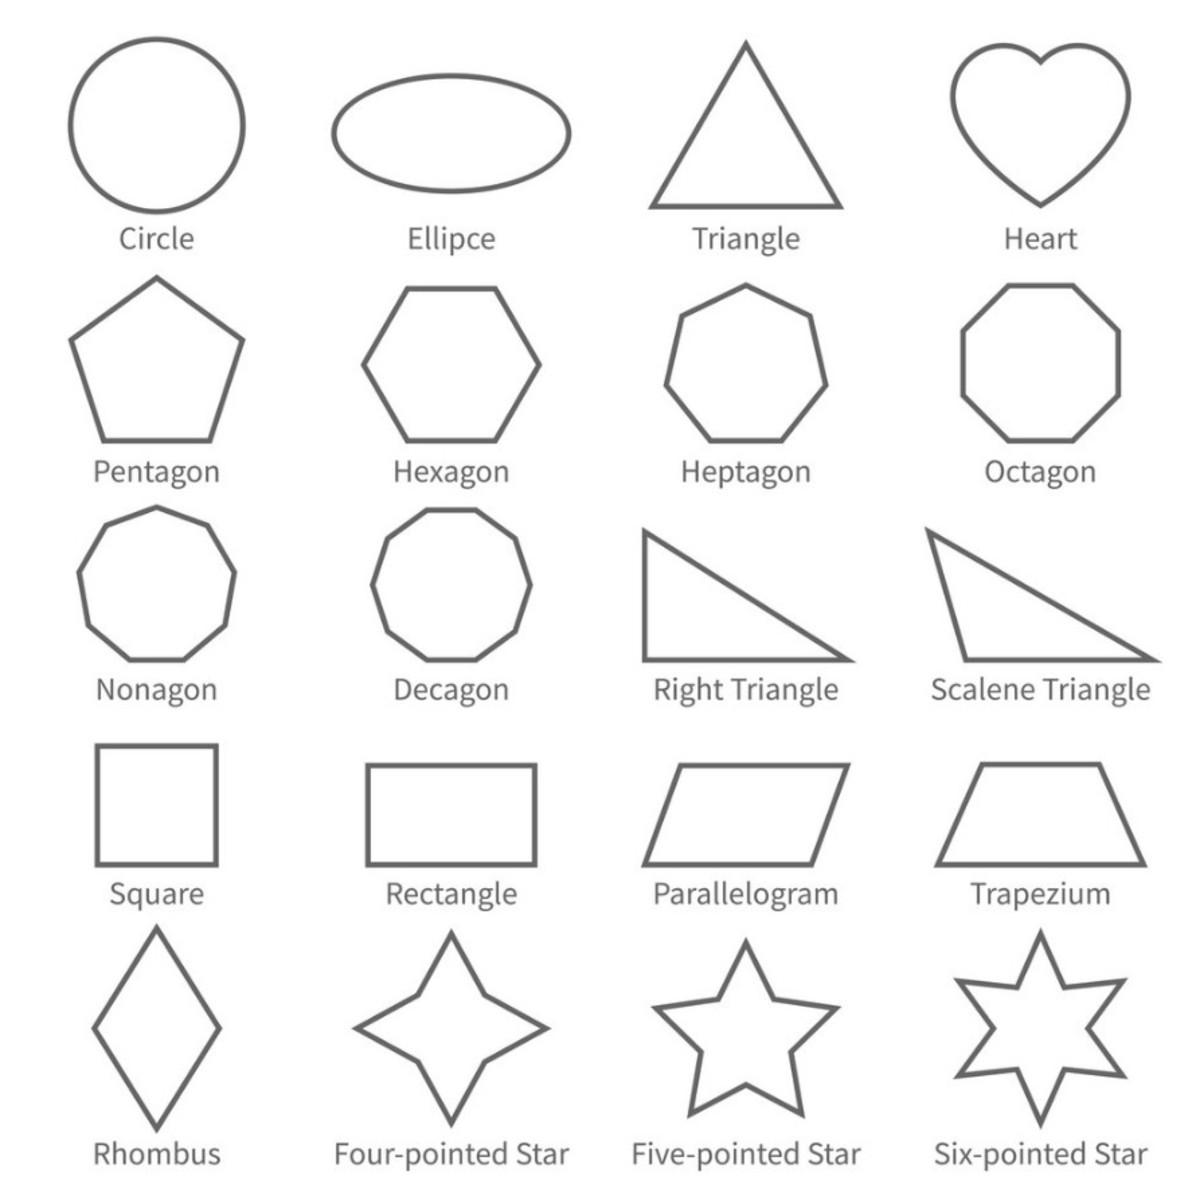 Teaching Geometry Through Paper Folding